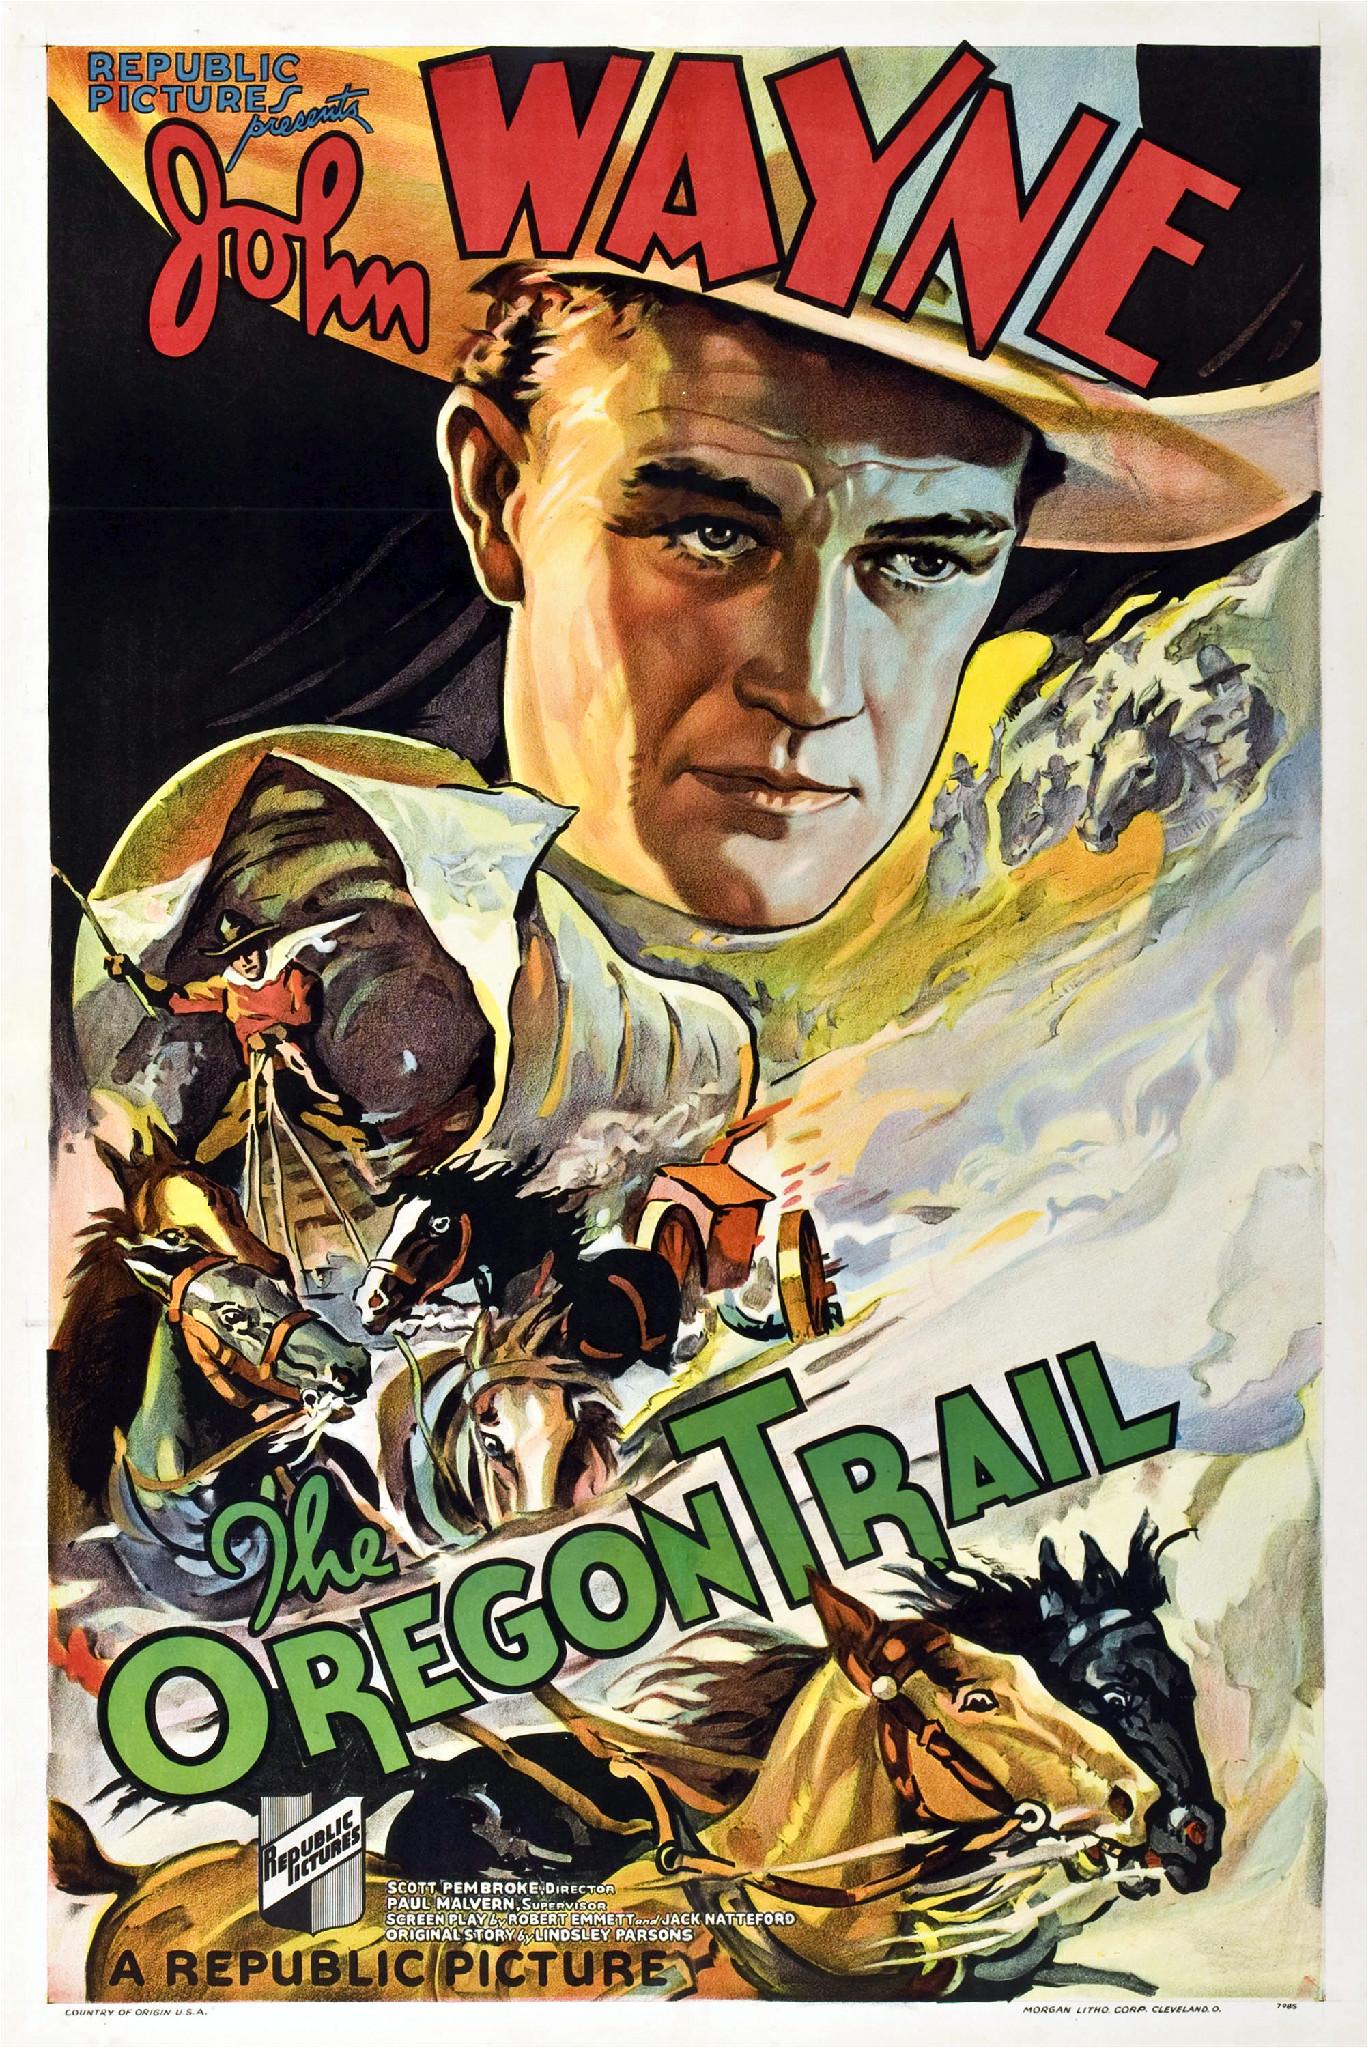 The Oregon Trail Film